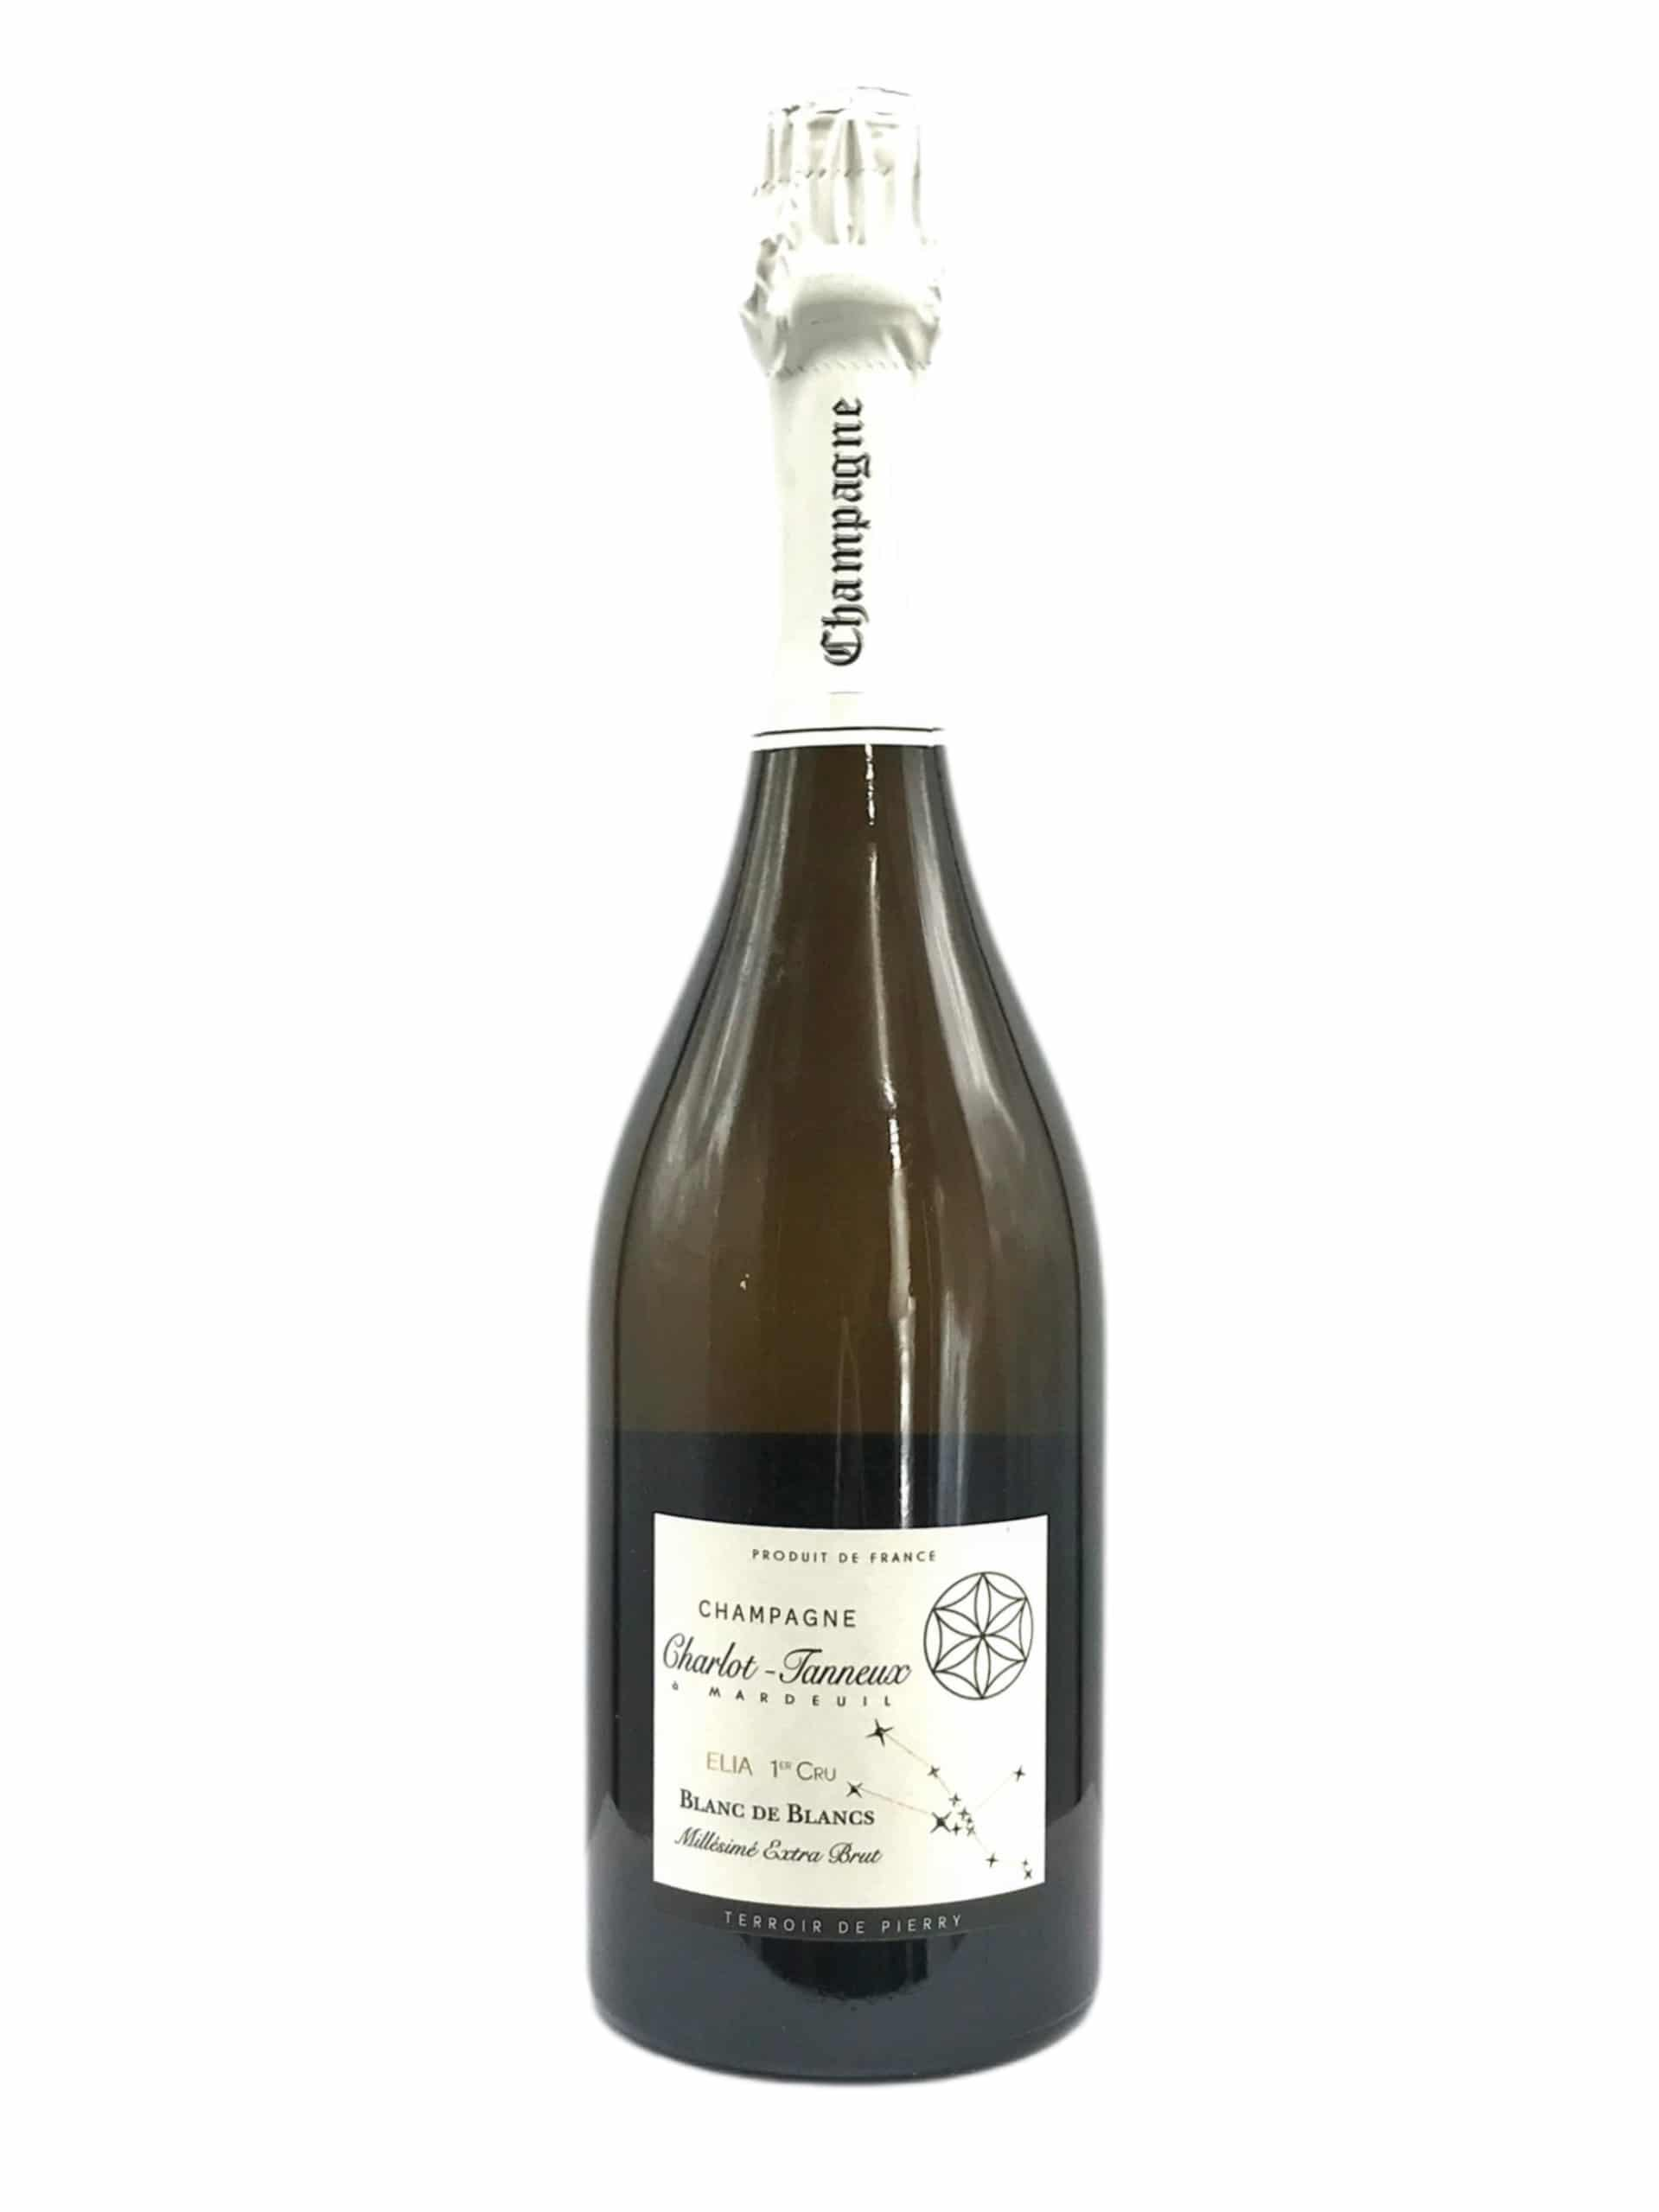 Champagne Charlot Tanneux Cuvee Elia